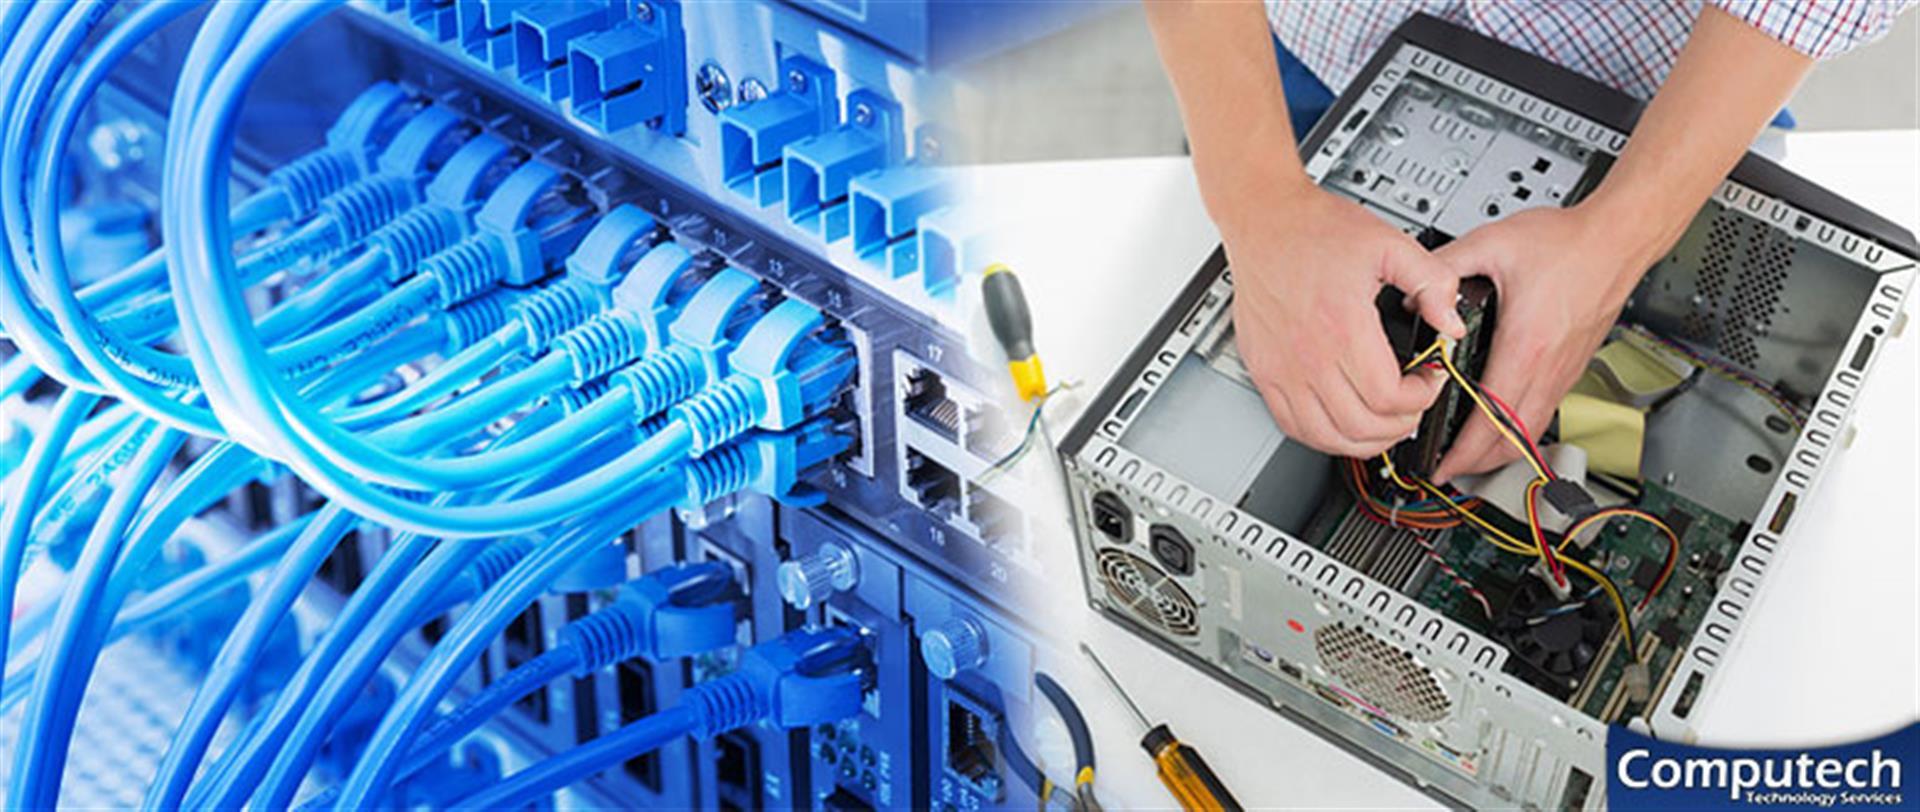 Camilla Georgia Onsite PC & Printer Repairs, Networking, Voice & Data Cabling Contractors